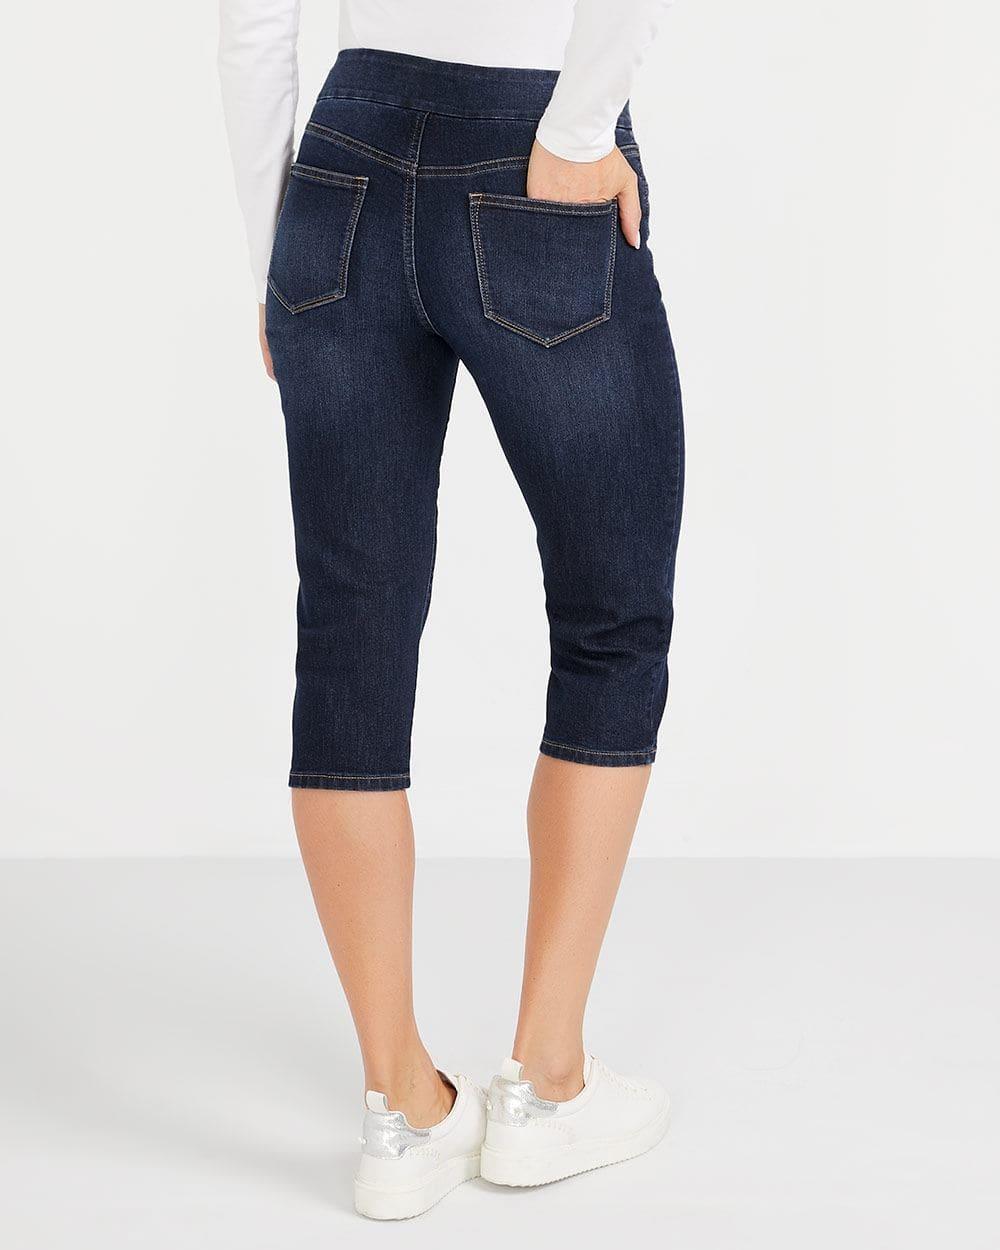 Dark Wash Capri Jeans